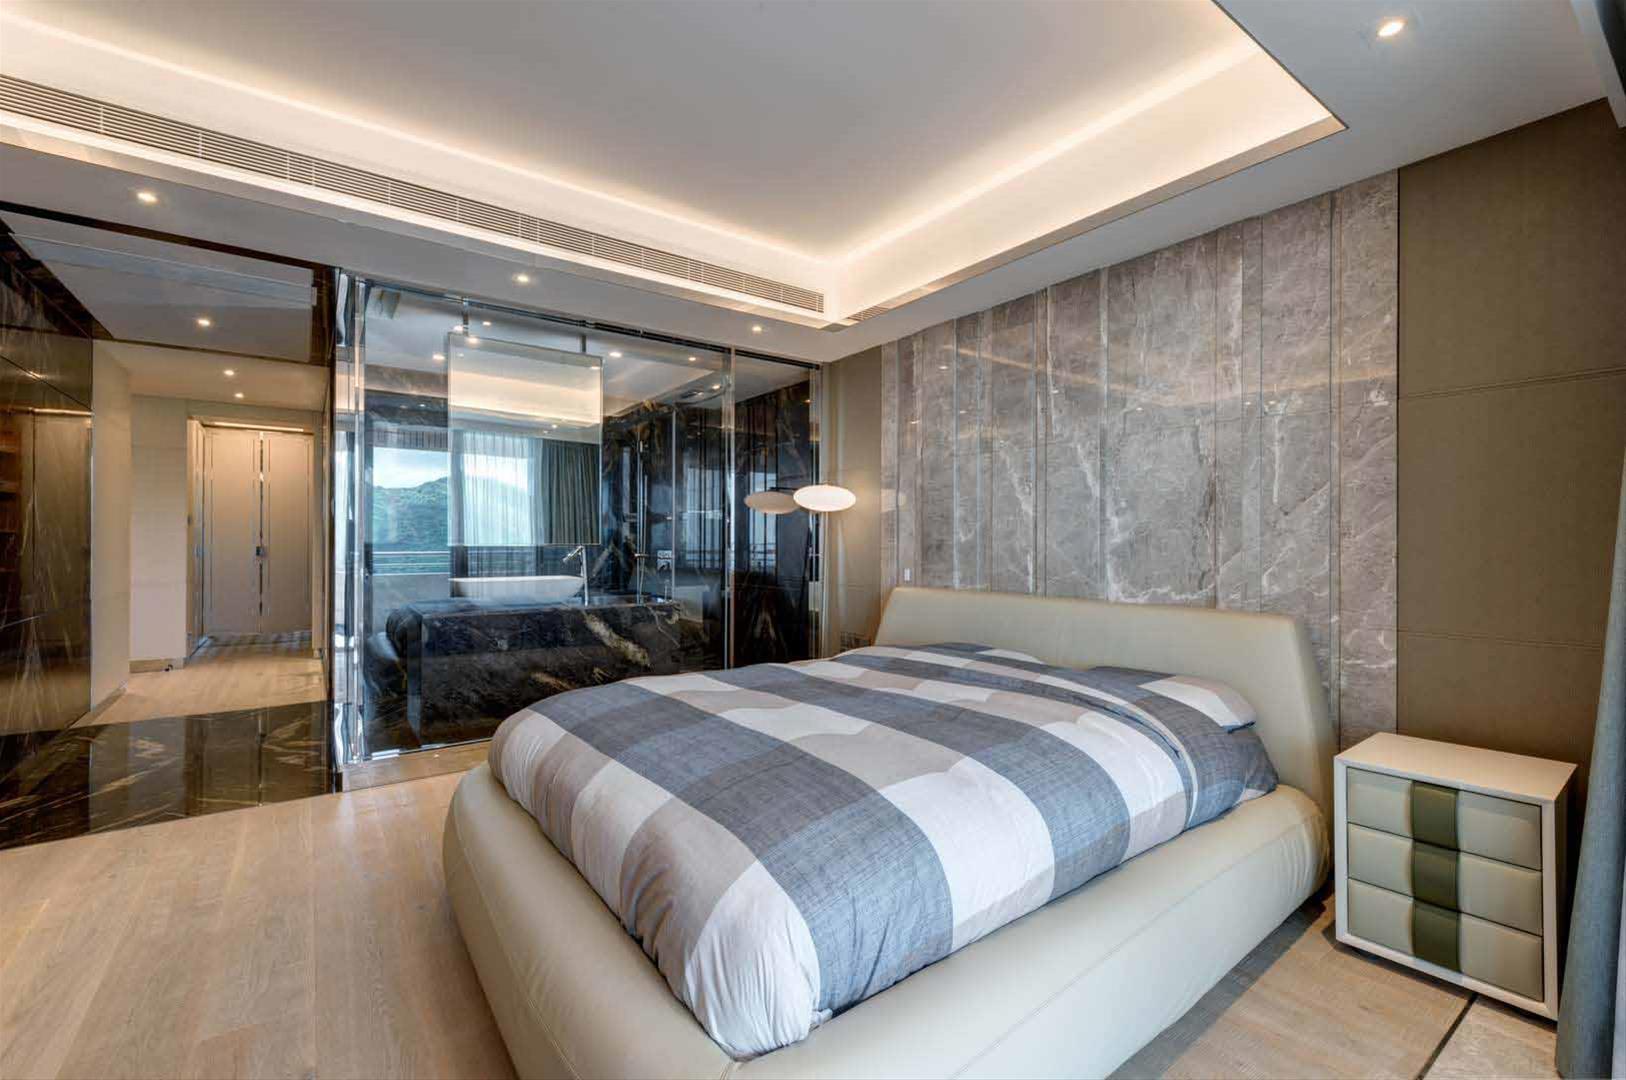 Elegant arredamento per una casa di lusso in cina with for Arredamento casa di lusso